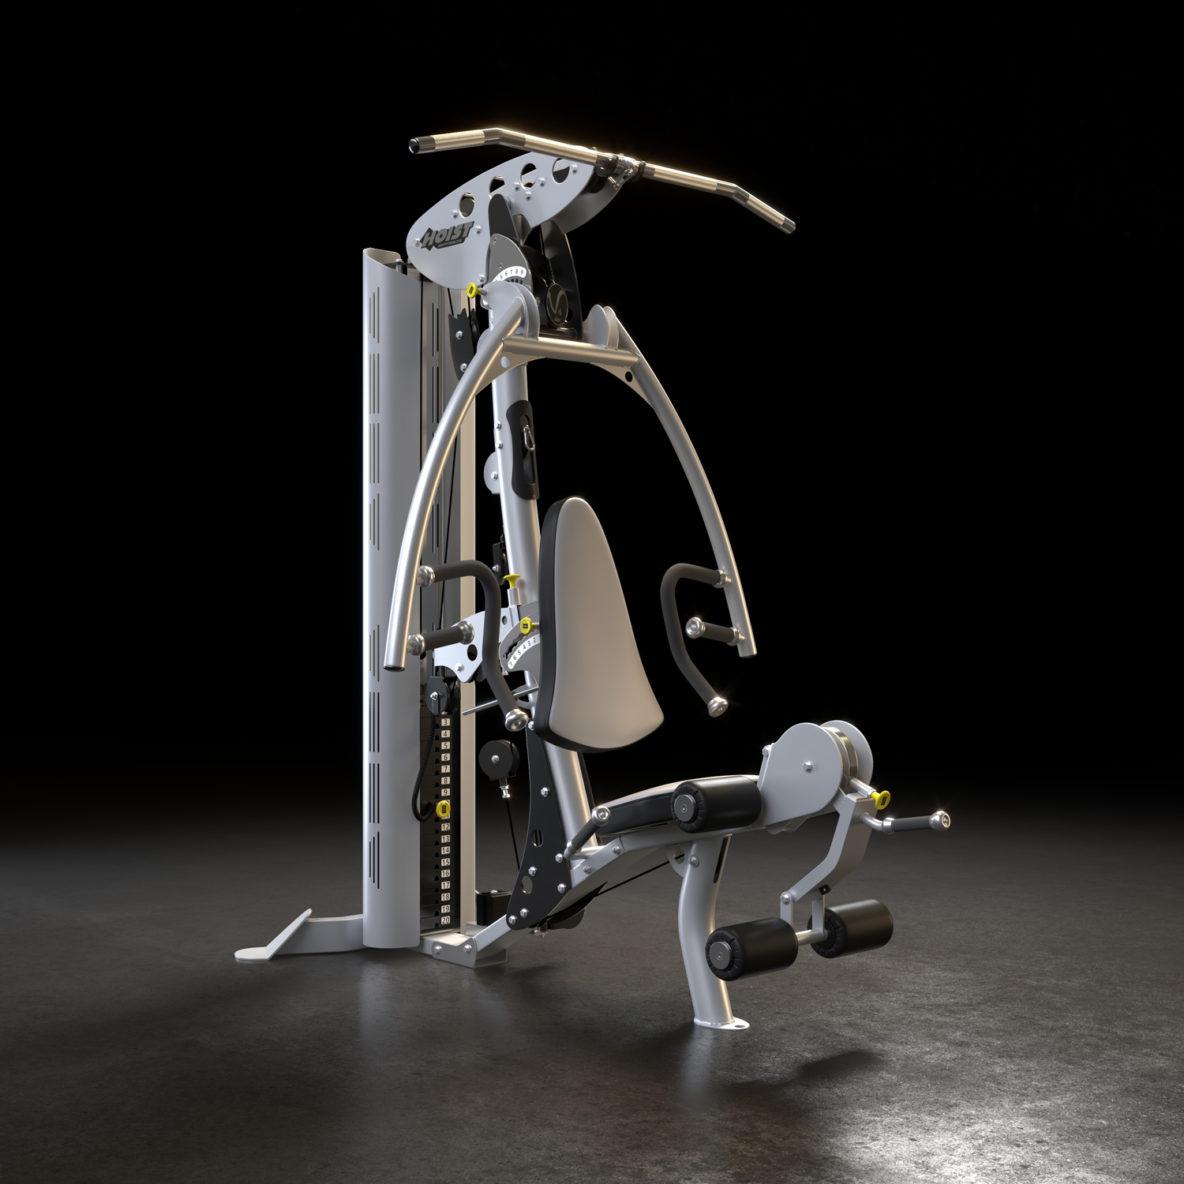 Photoreal 3D Modeling for Training Equipment